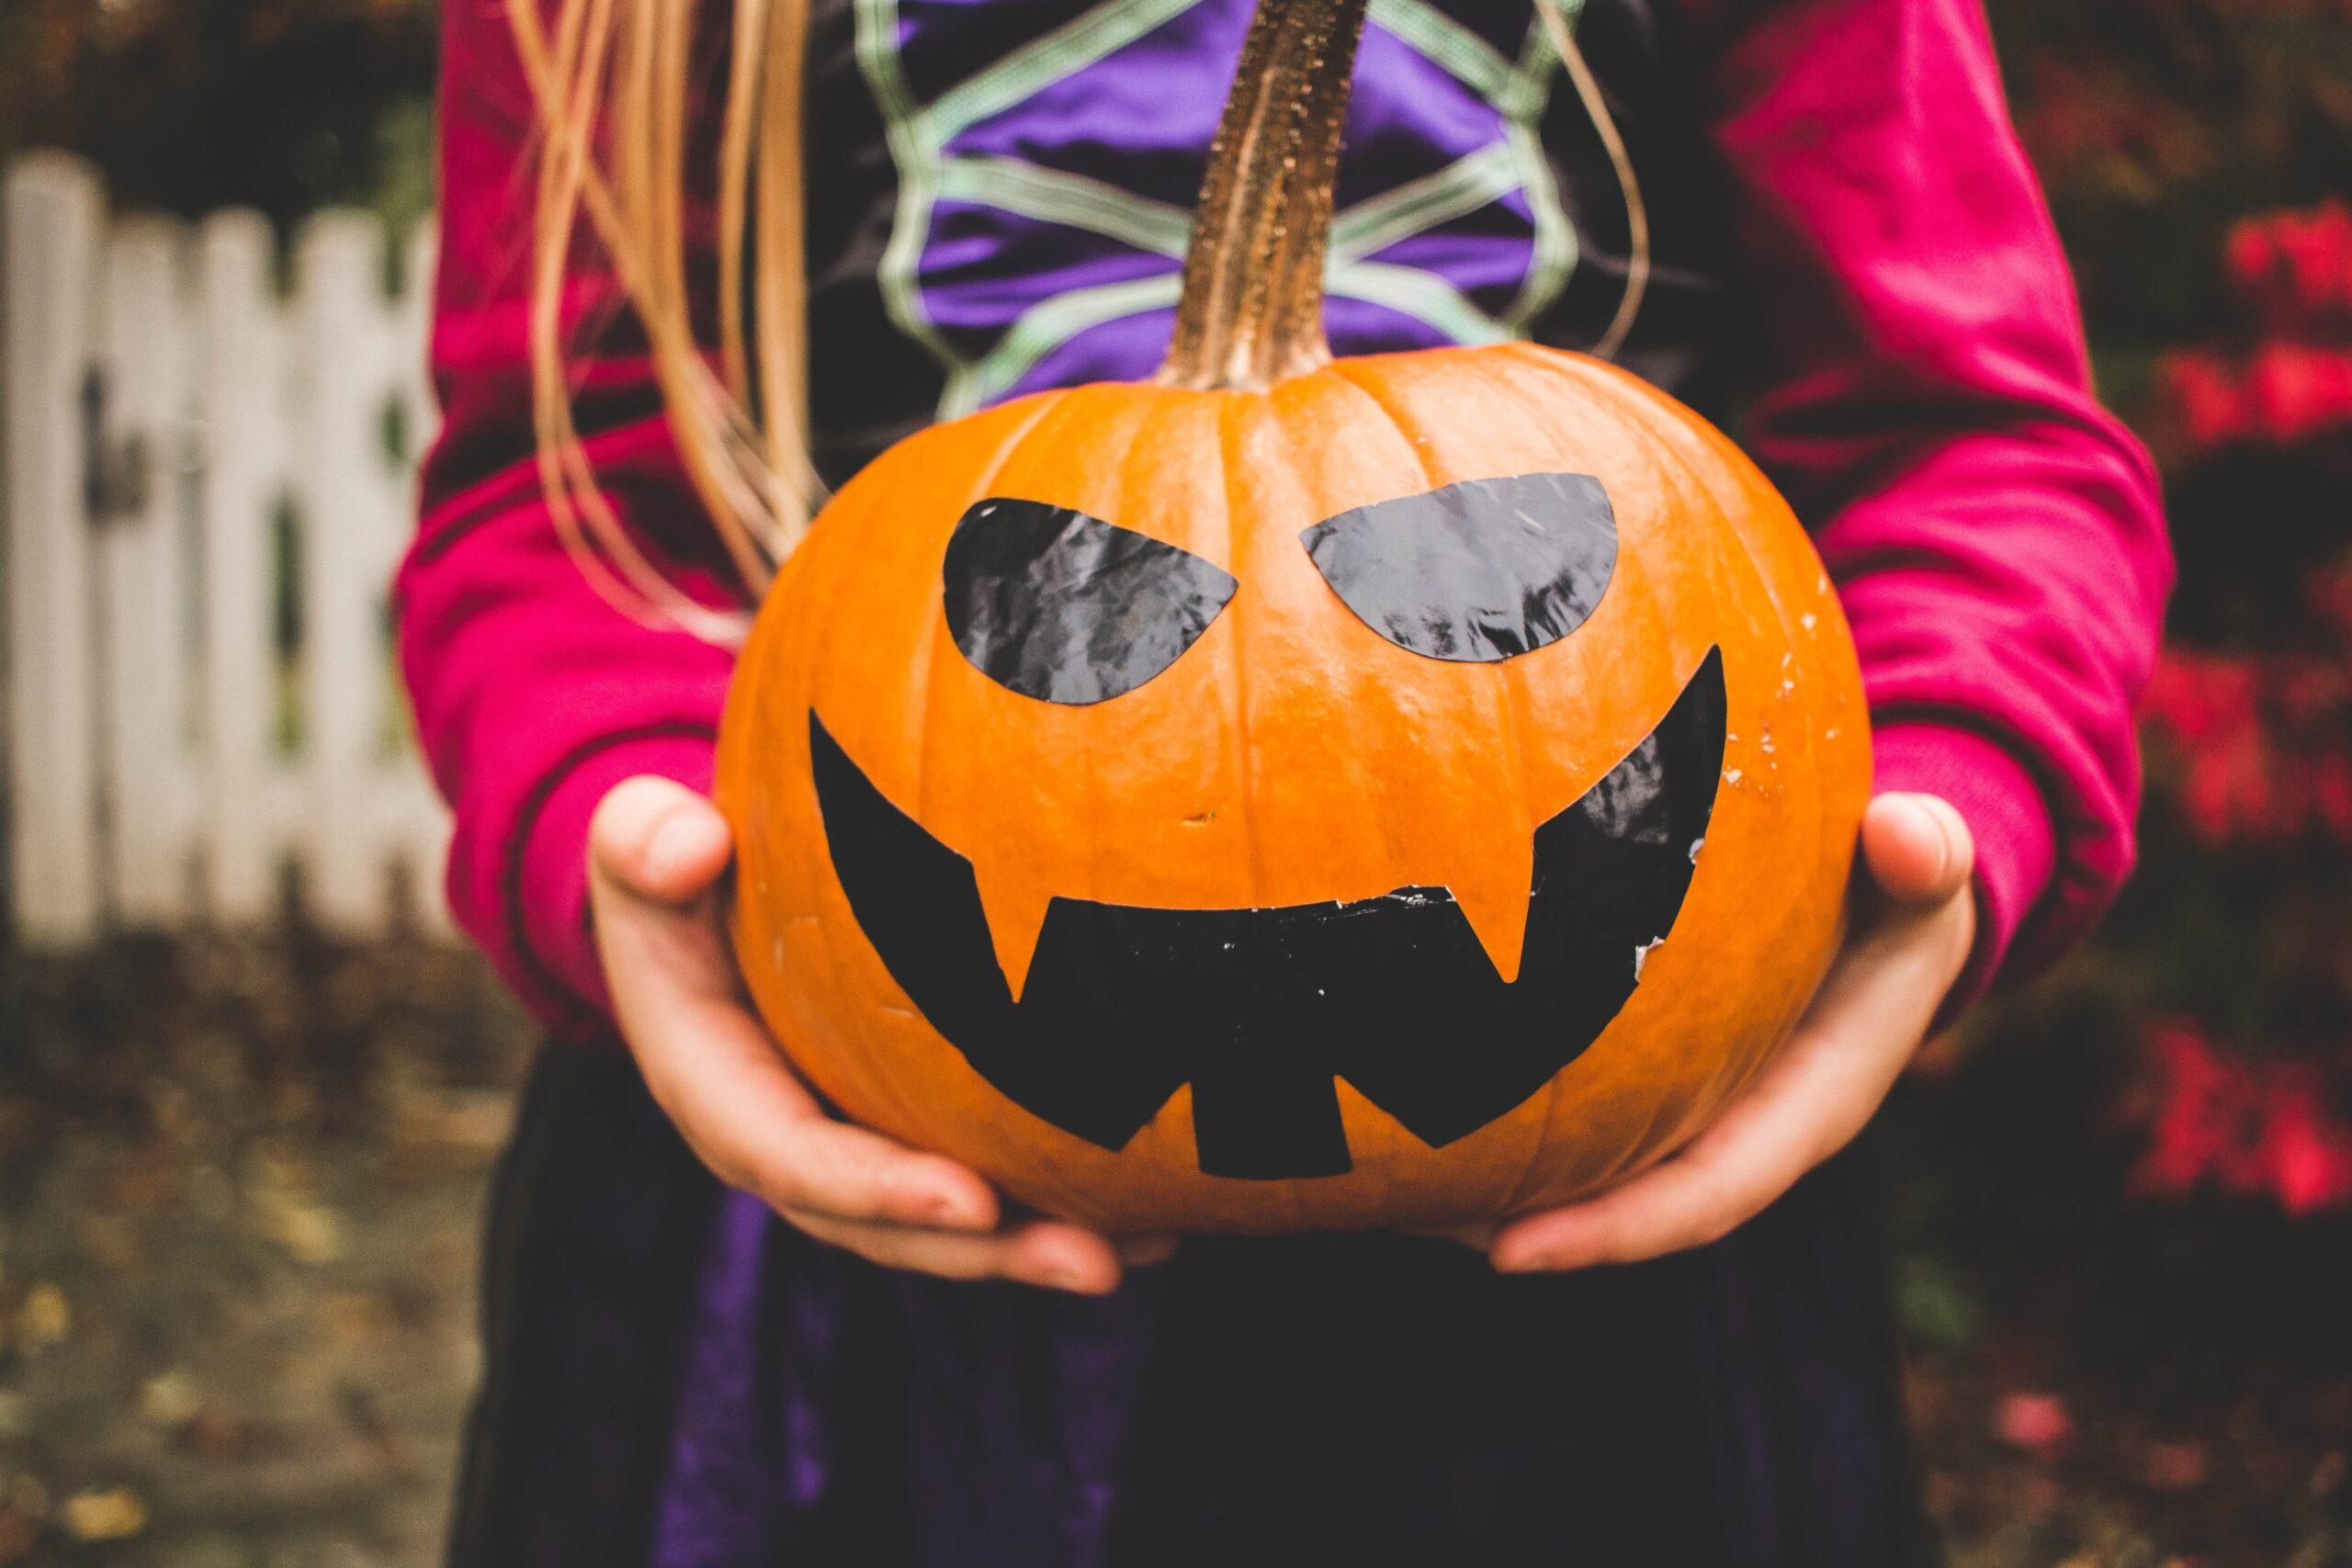 Kind hält dekorierten Halloween Kürbis vor Körper